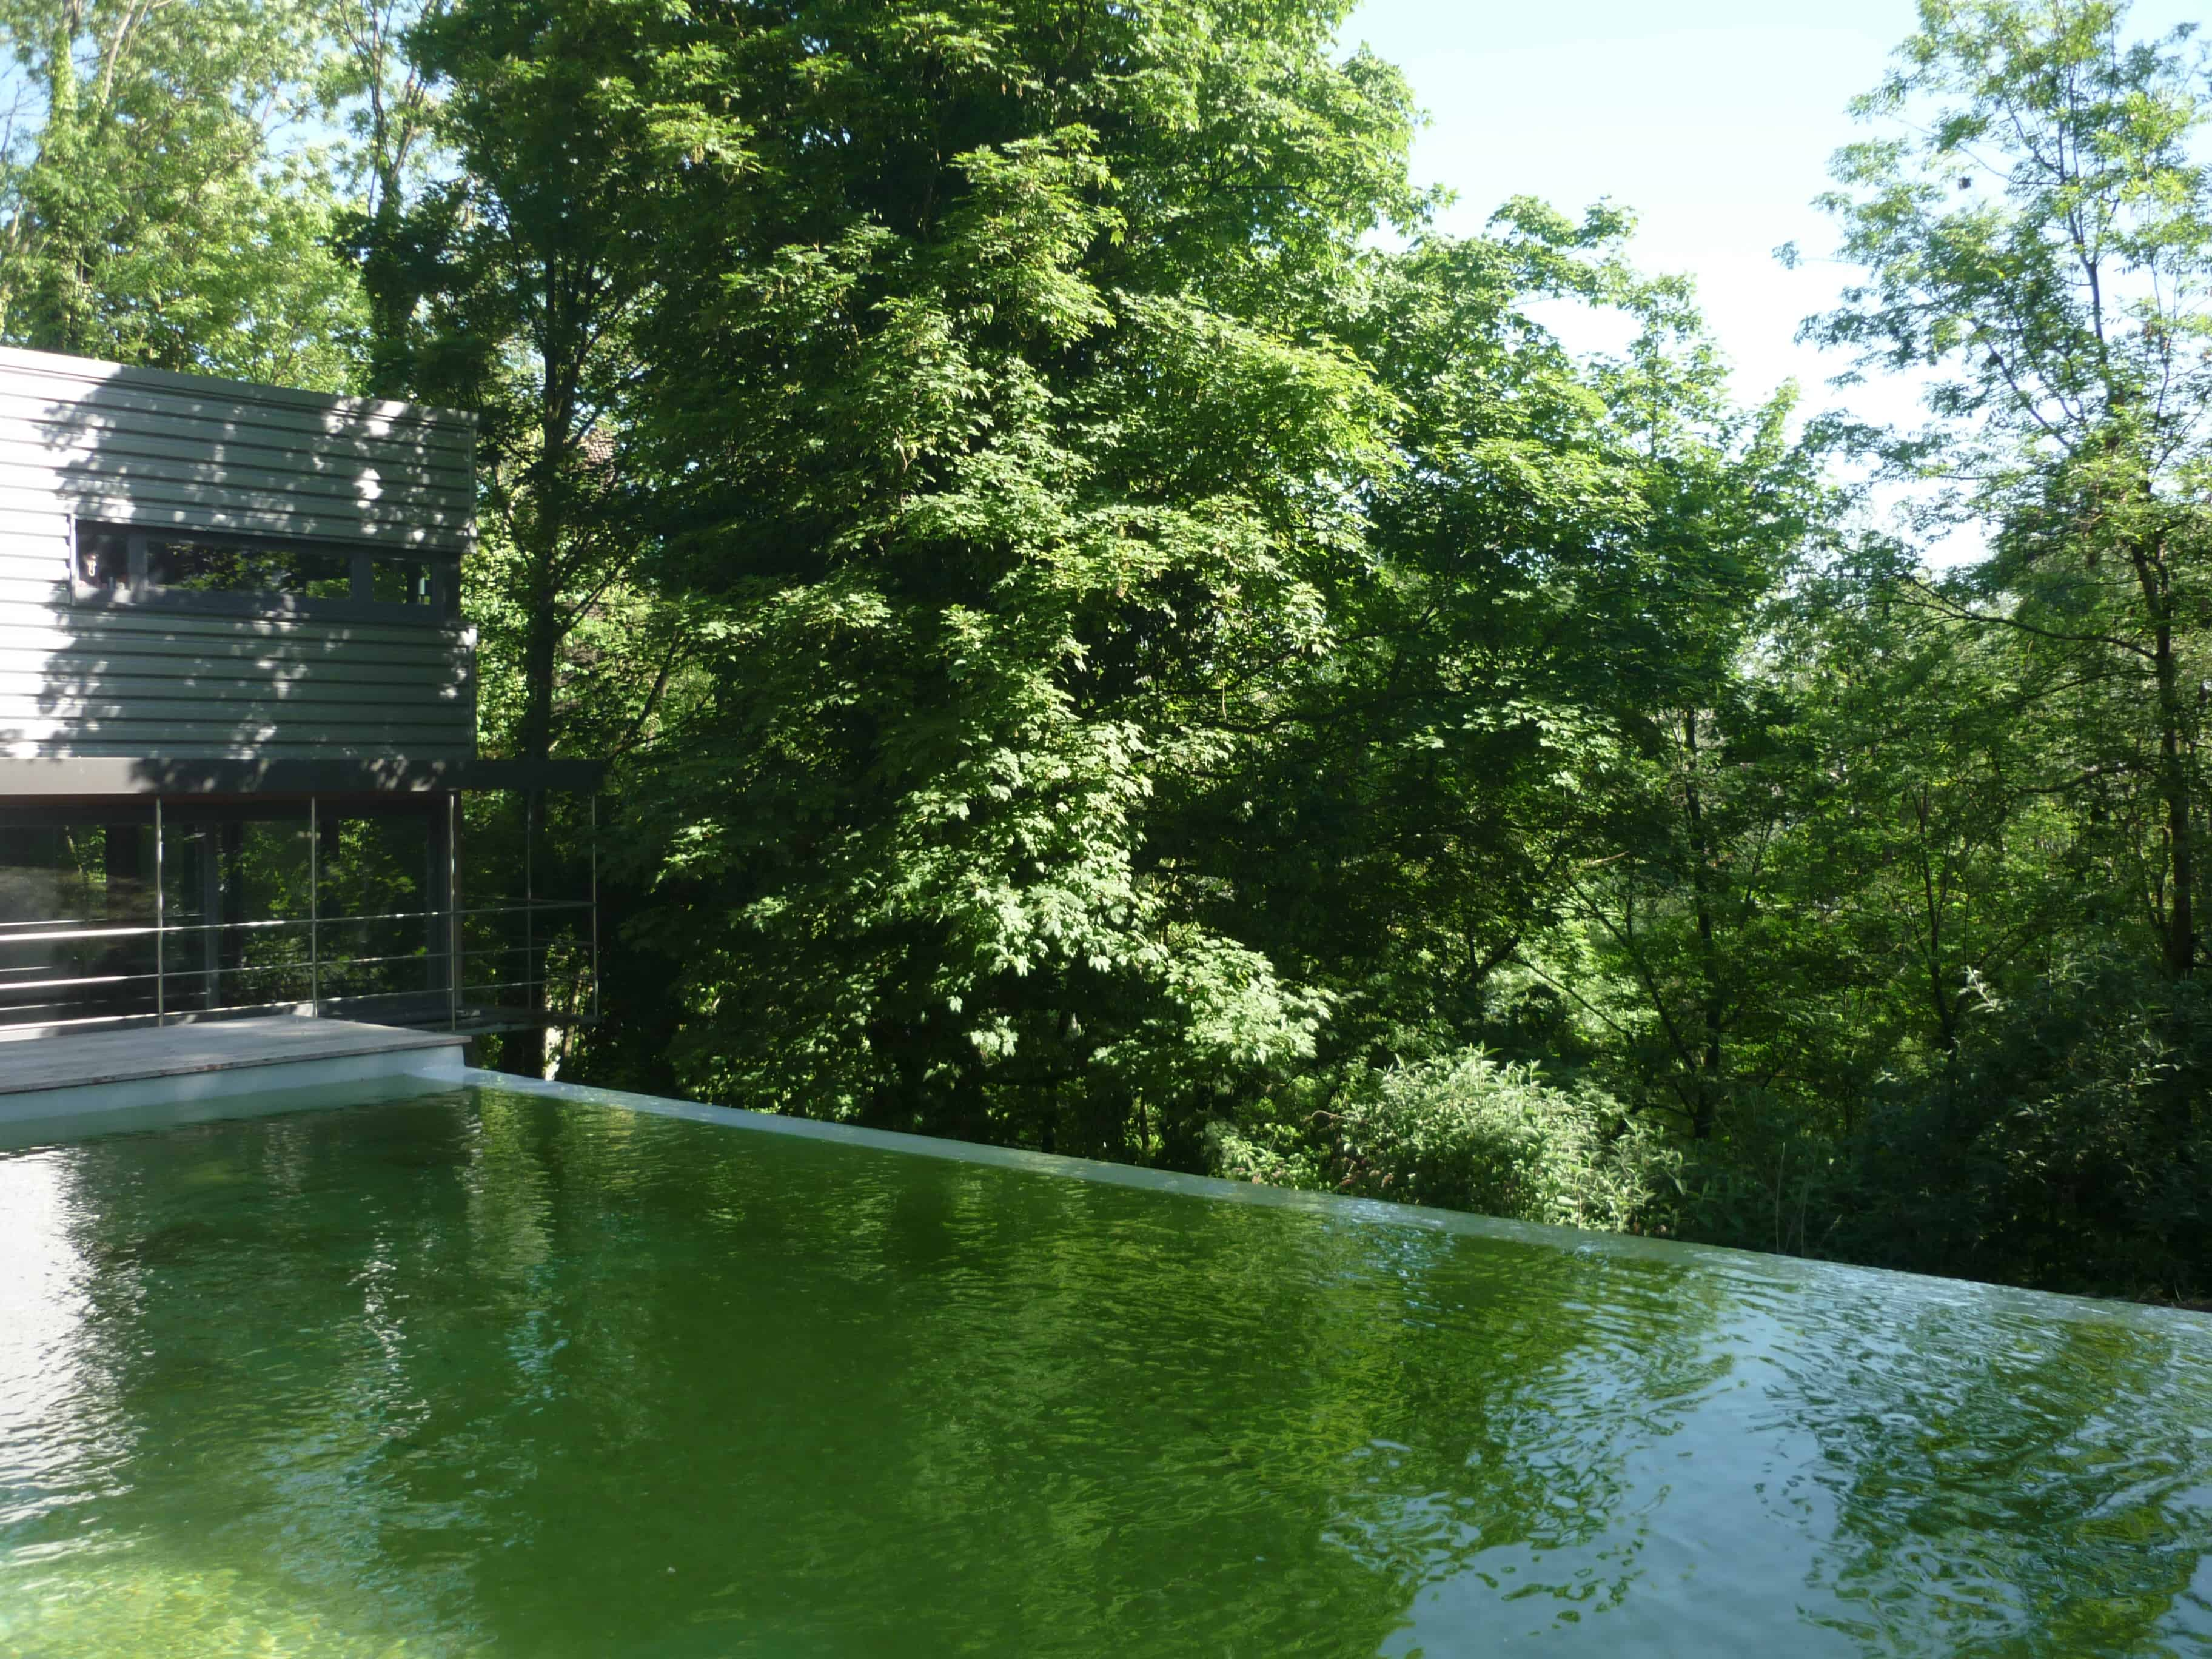 étang piscine naturel débordement